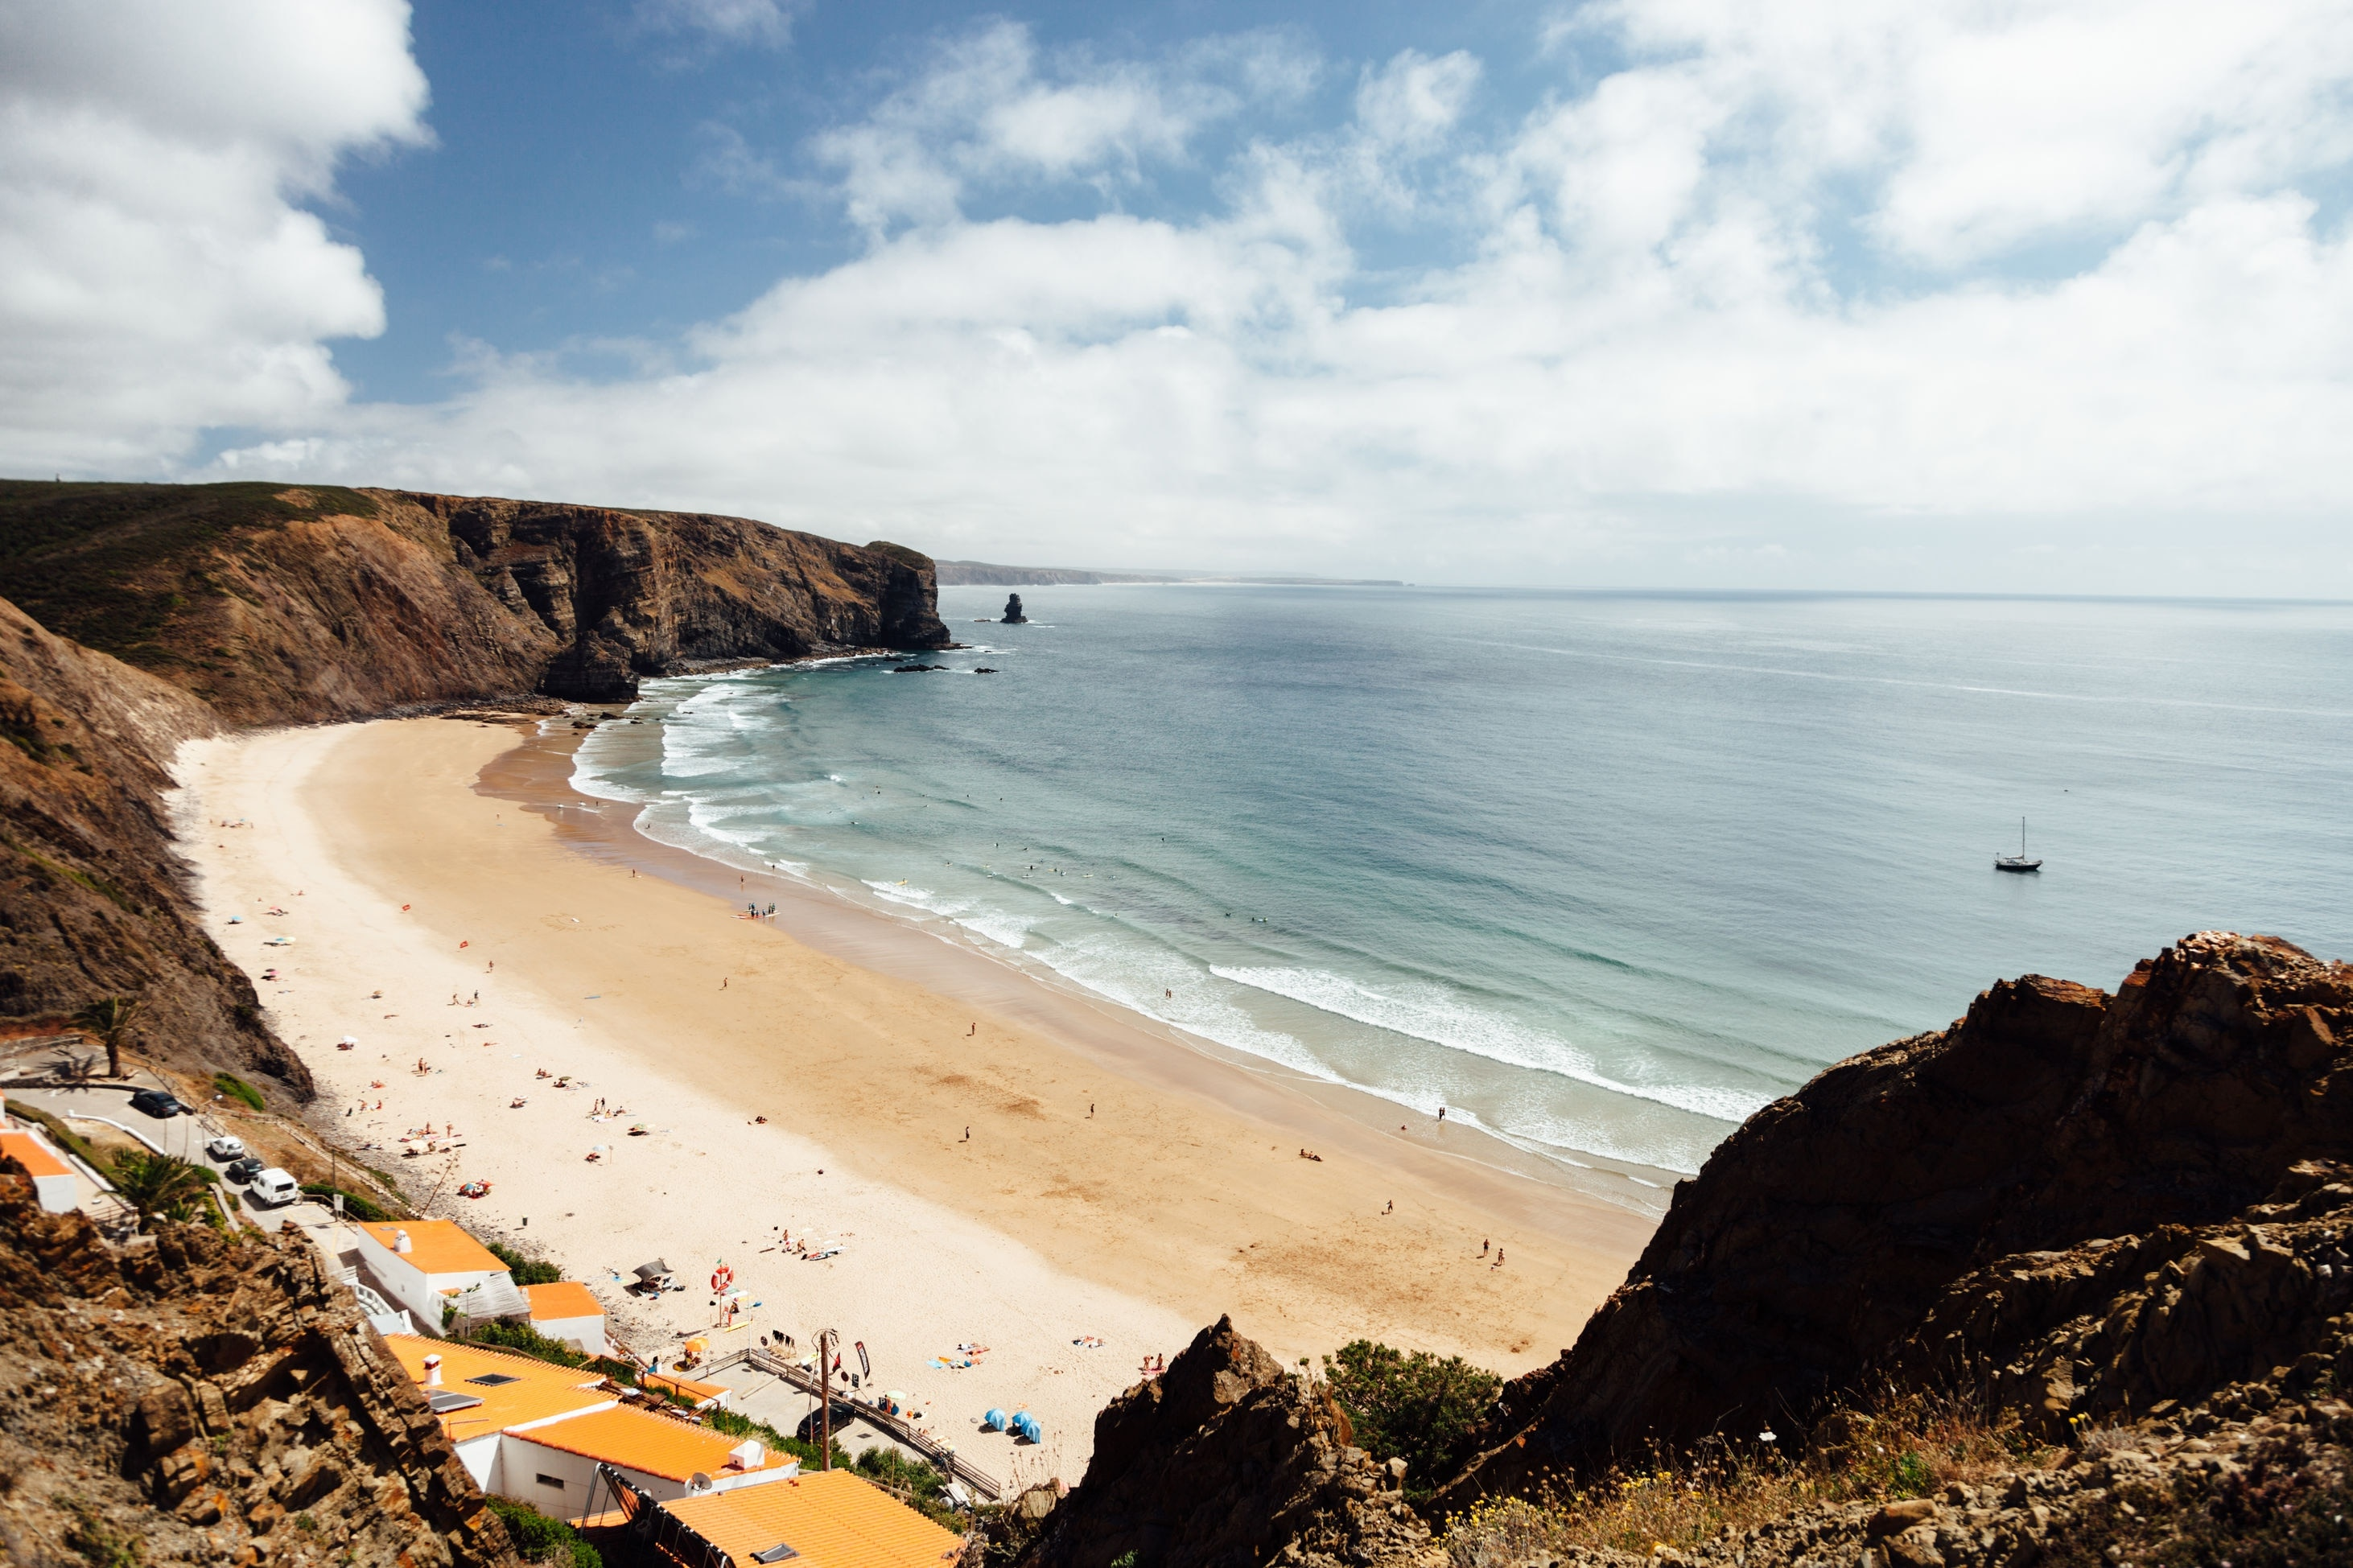 Praia da Arrifana, Aljezur, Bezirk Faro, Portugal